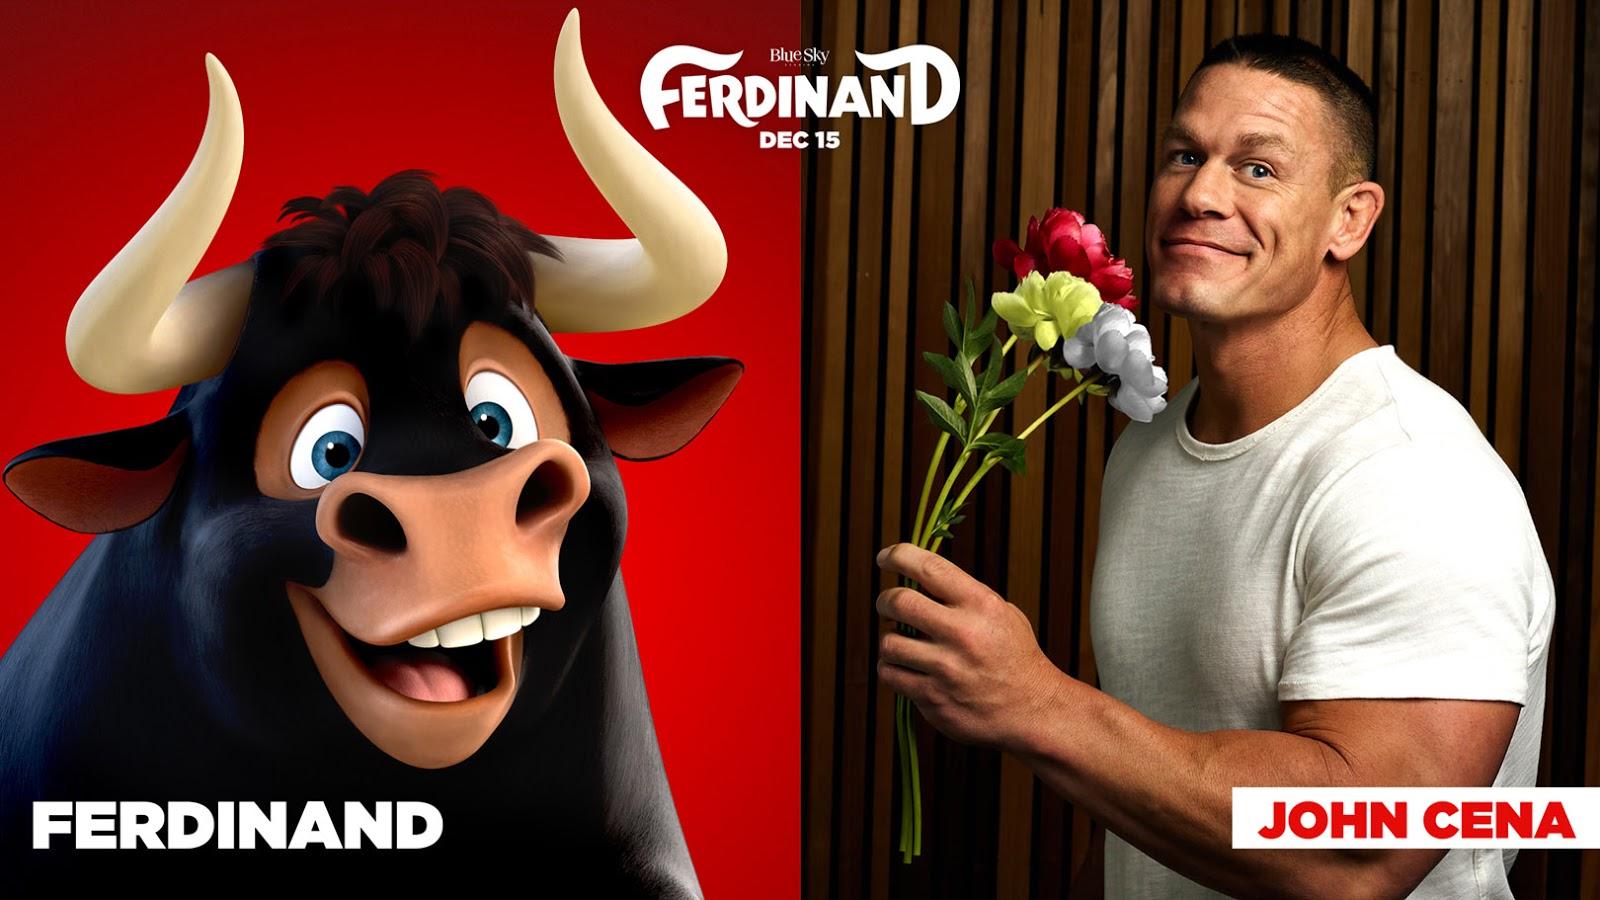 John Cena as Ferdinand